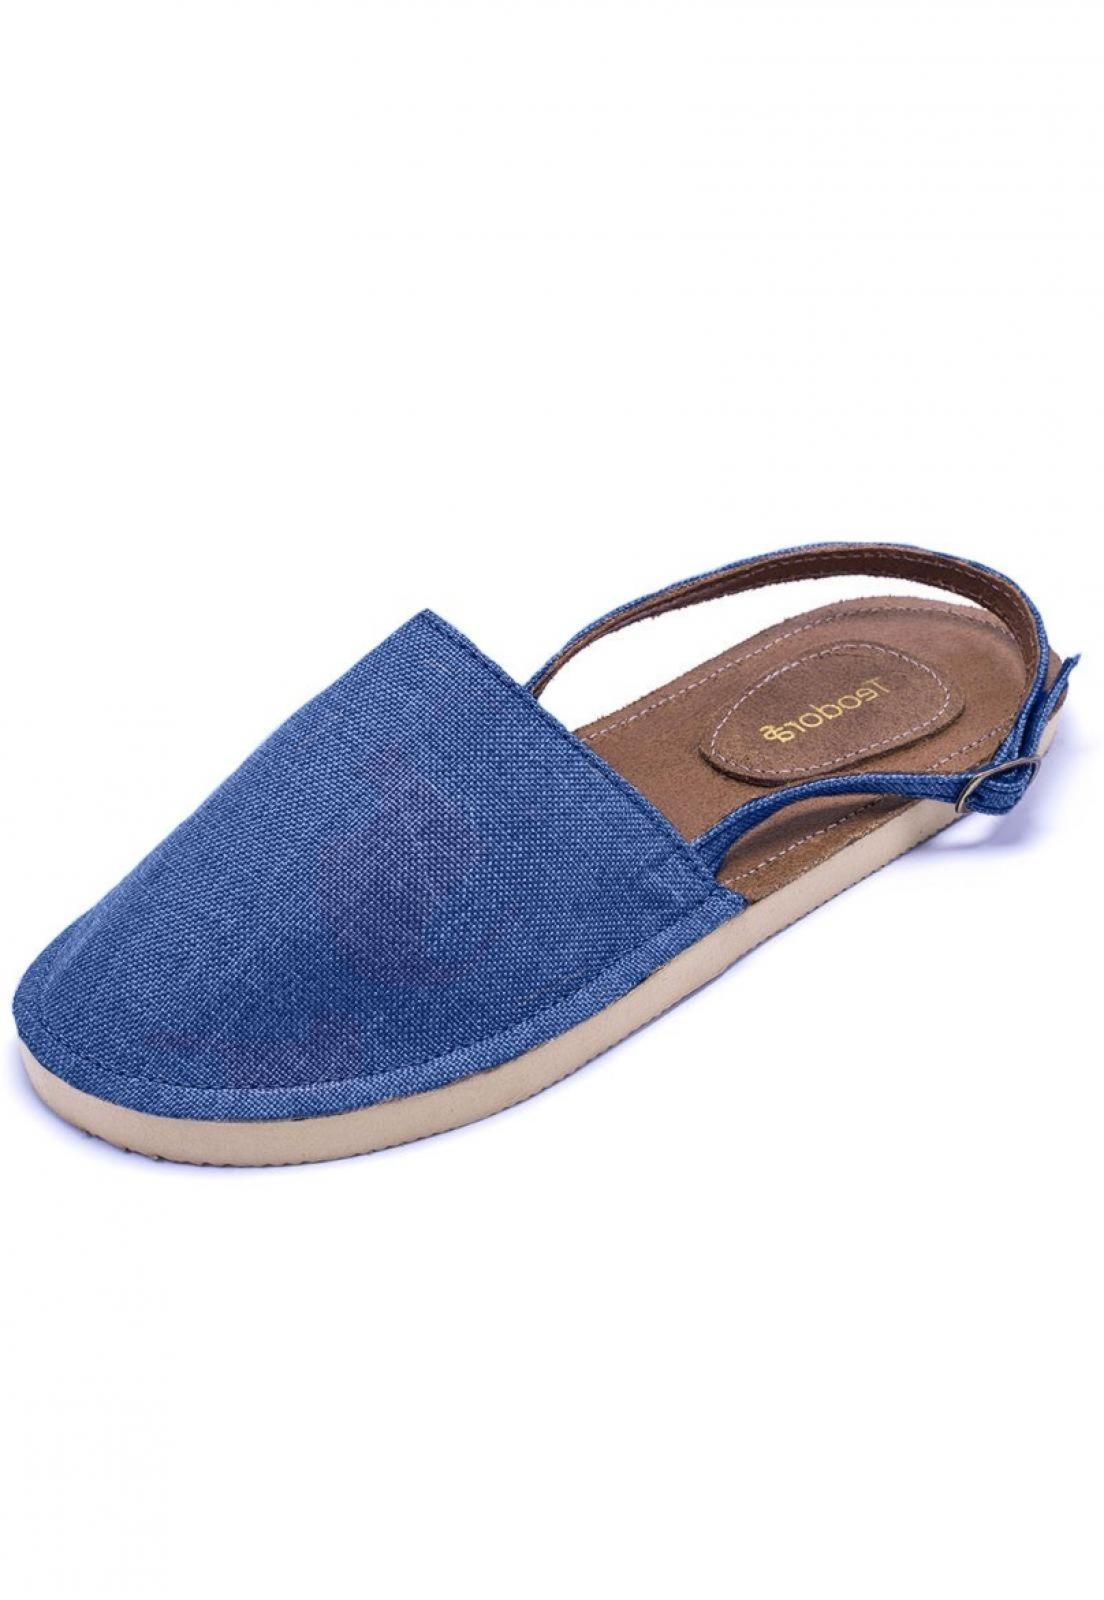 Alpargatas Teodora's Abertas Em Tecido AA1918 Azul Jeans